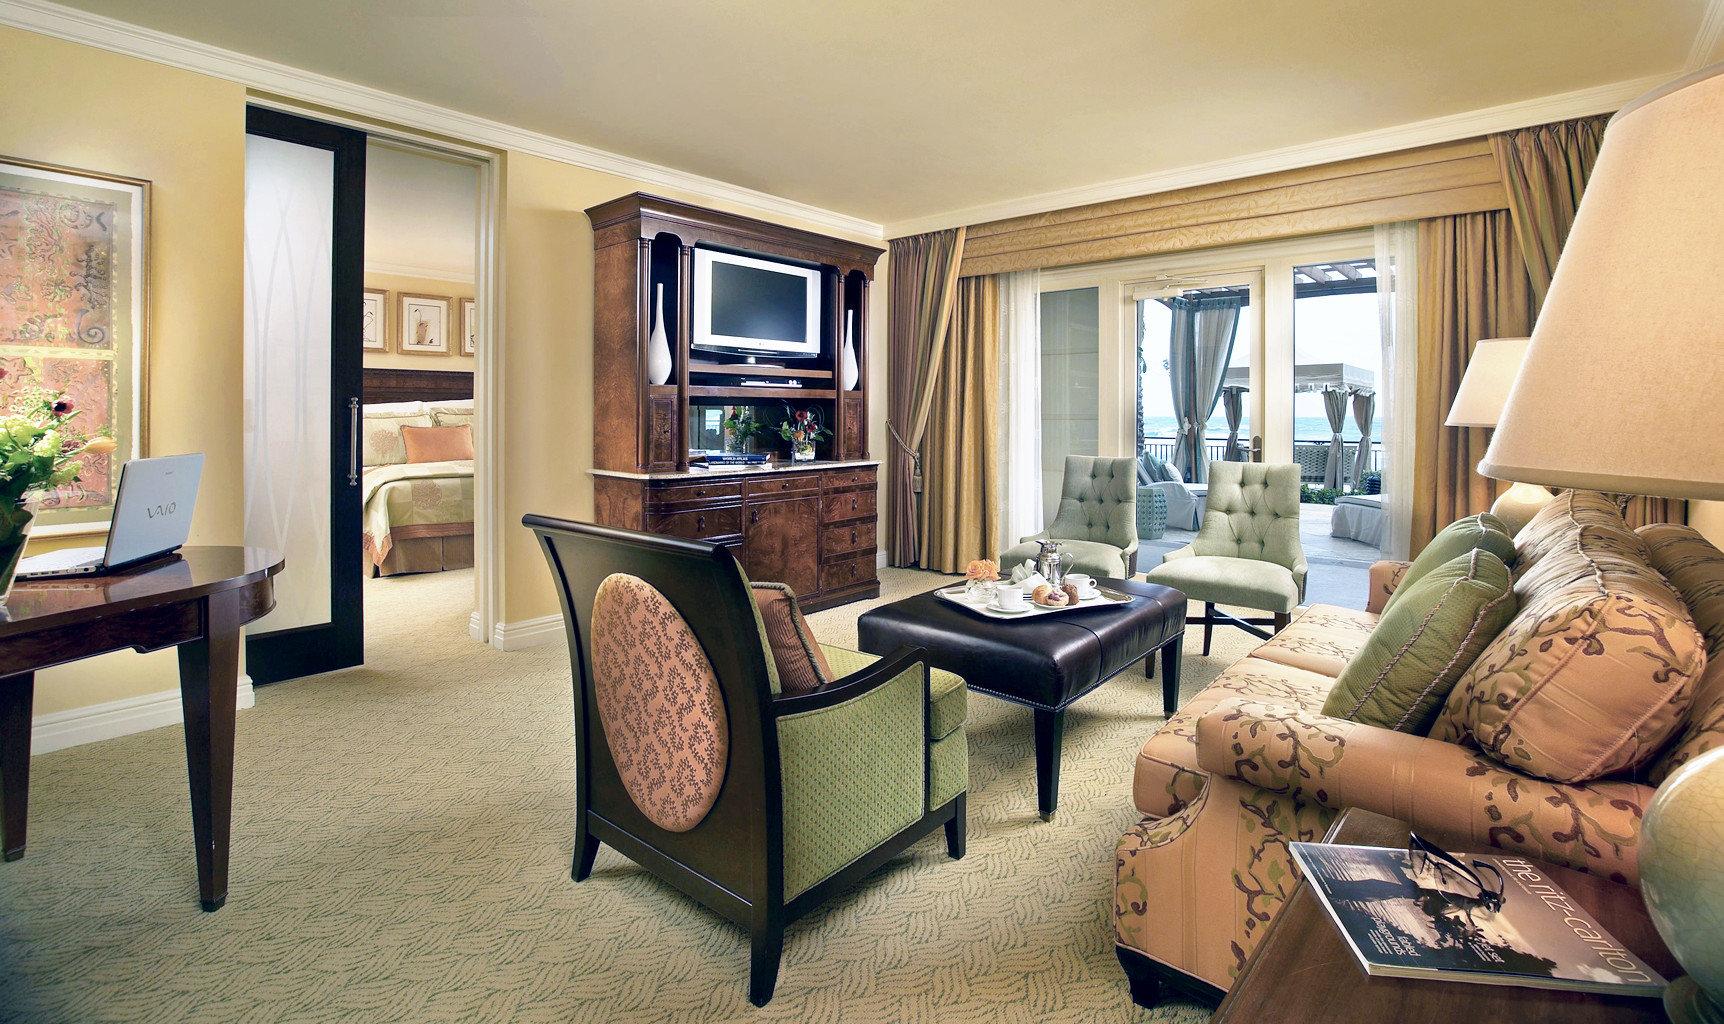 Bedroom Modern Patio Resort Scenic views Suite sofa property living room home condominium cottage leather